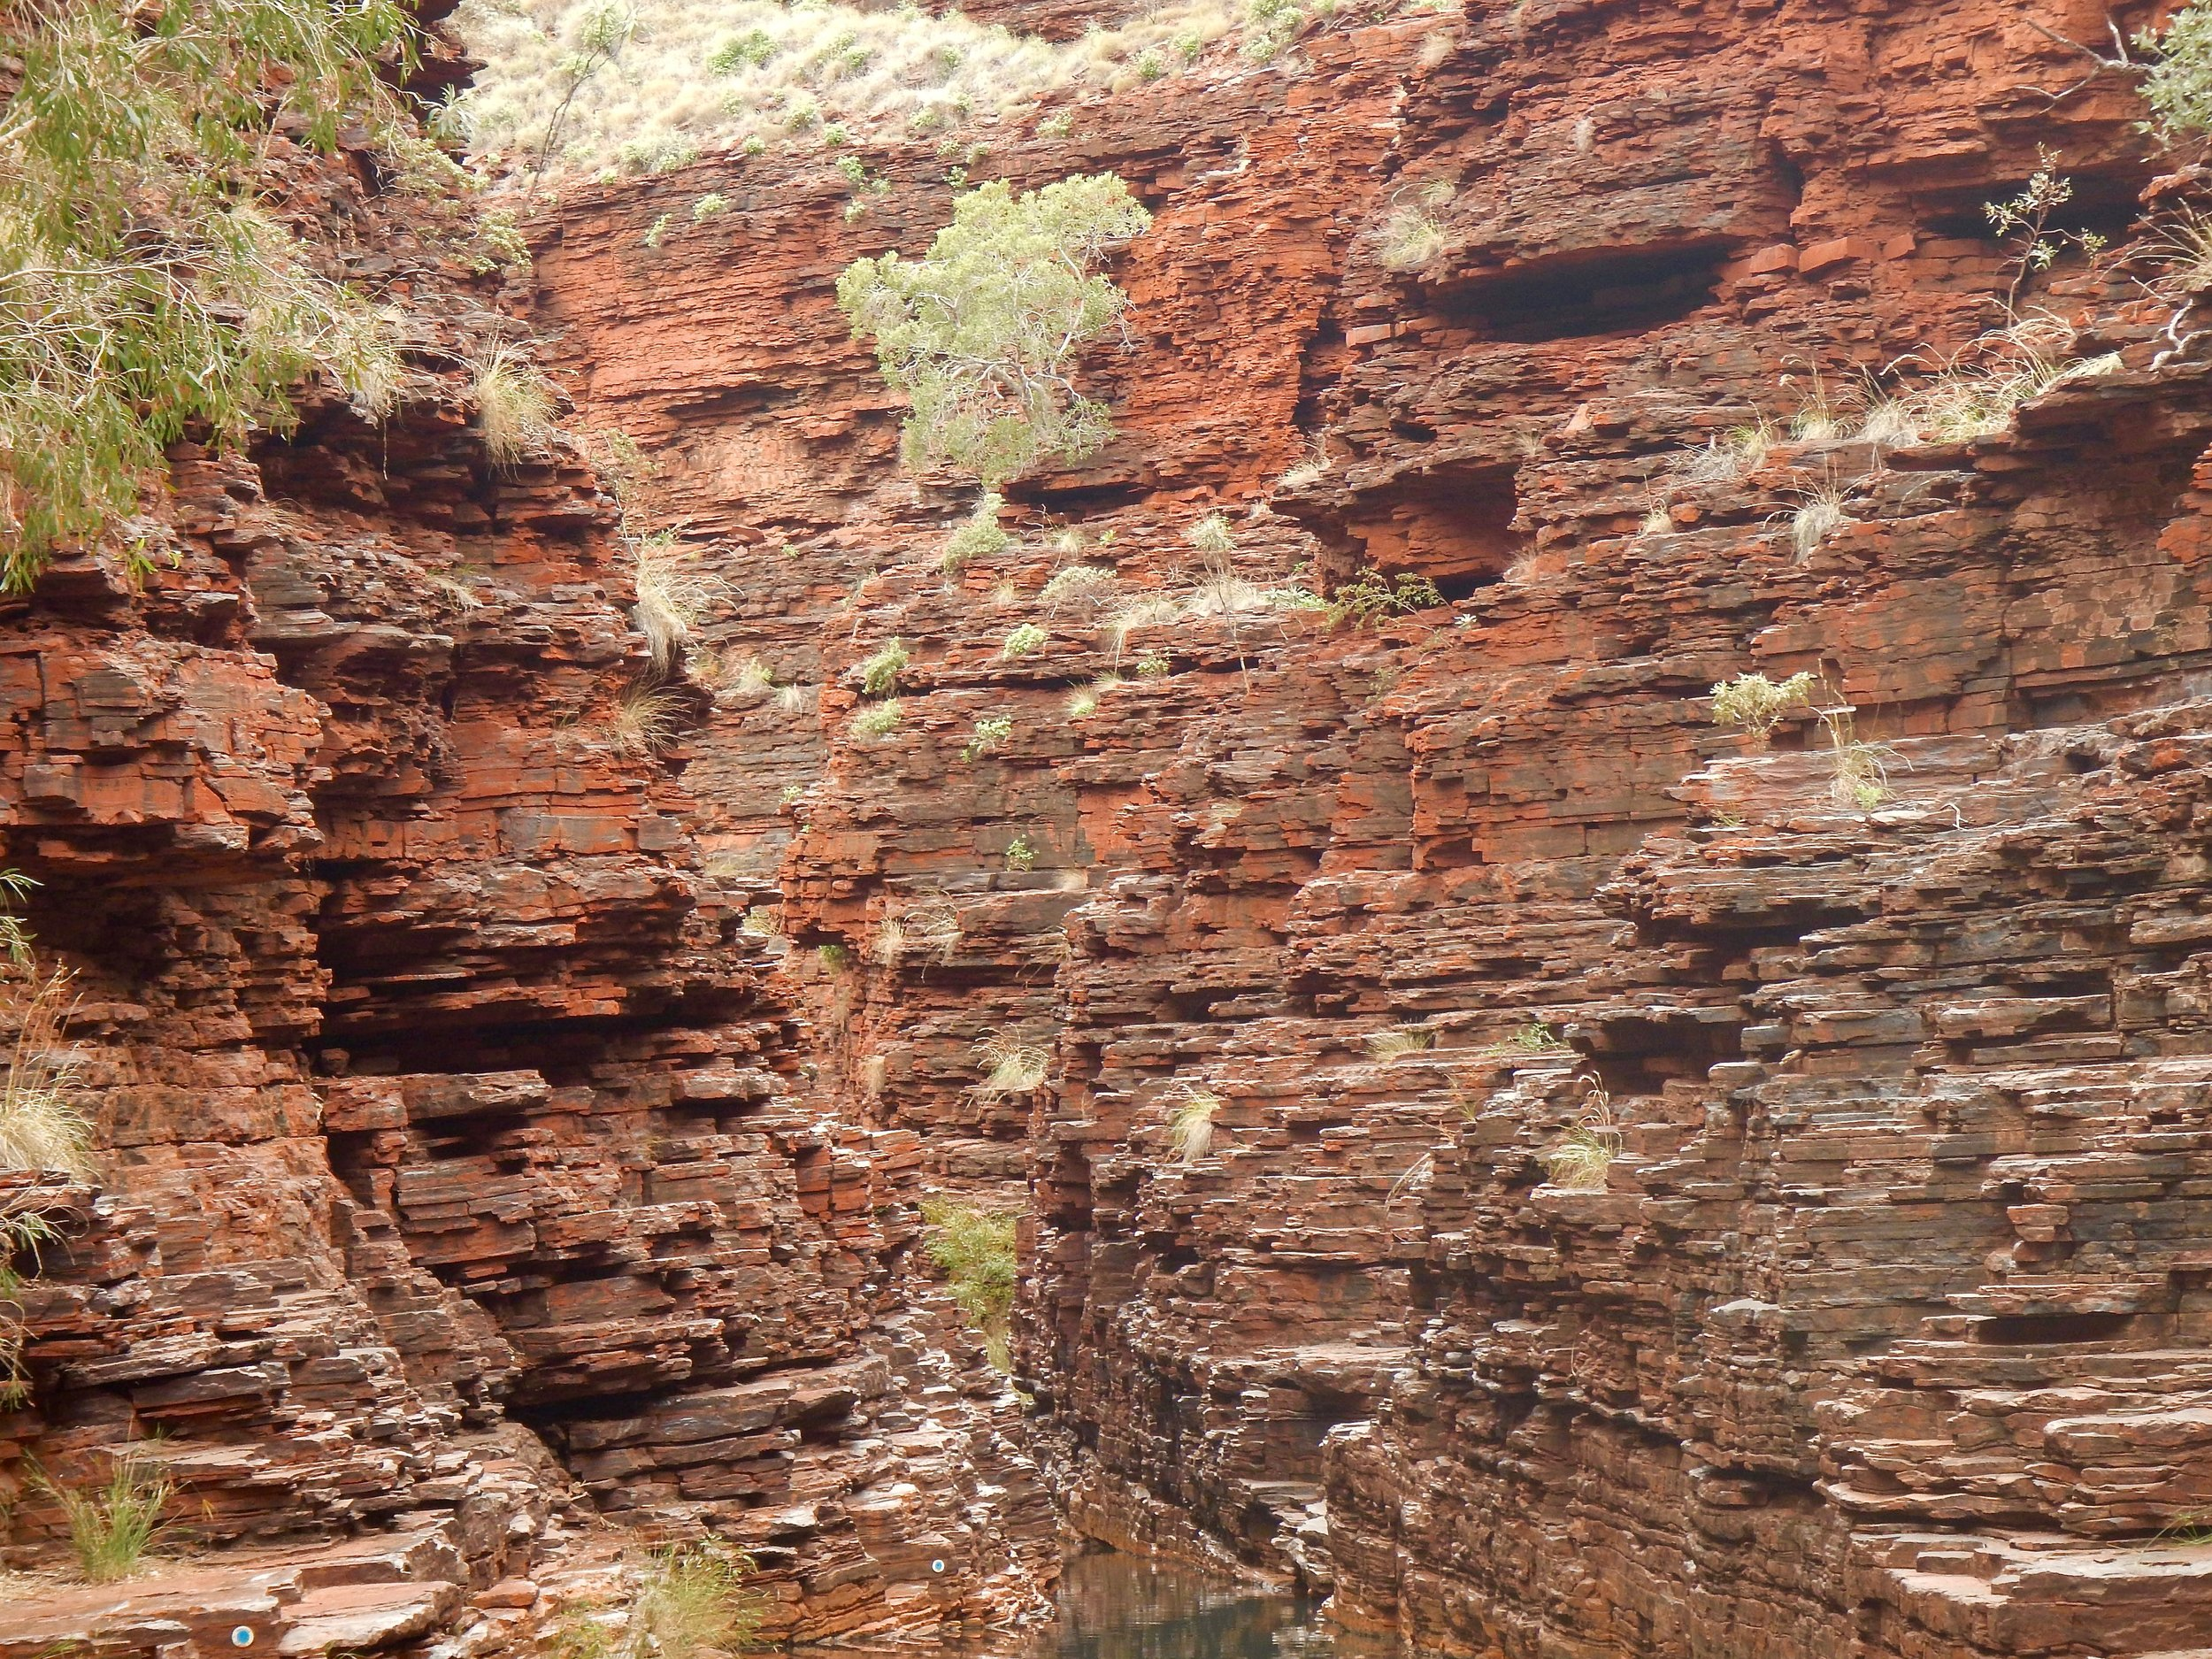 Karijini National Park, Western Australia @acrosslandsea